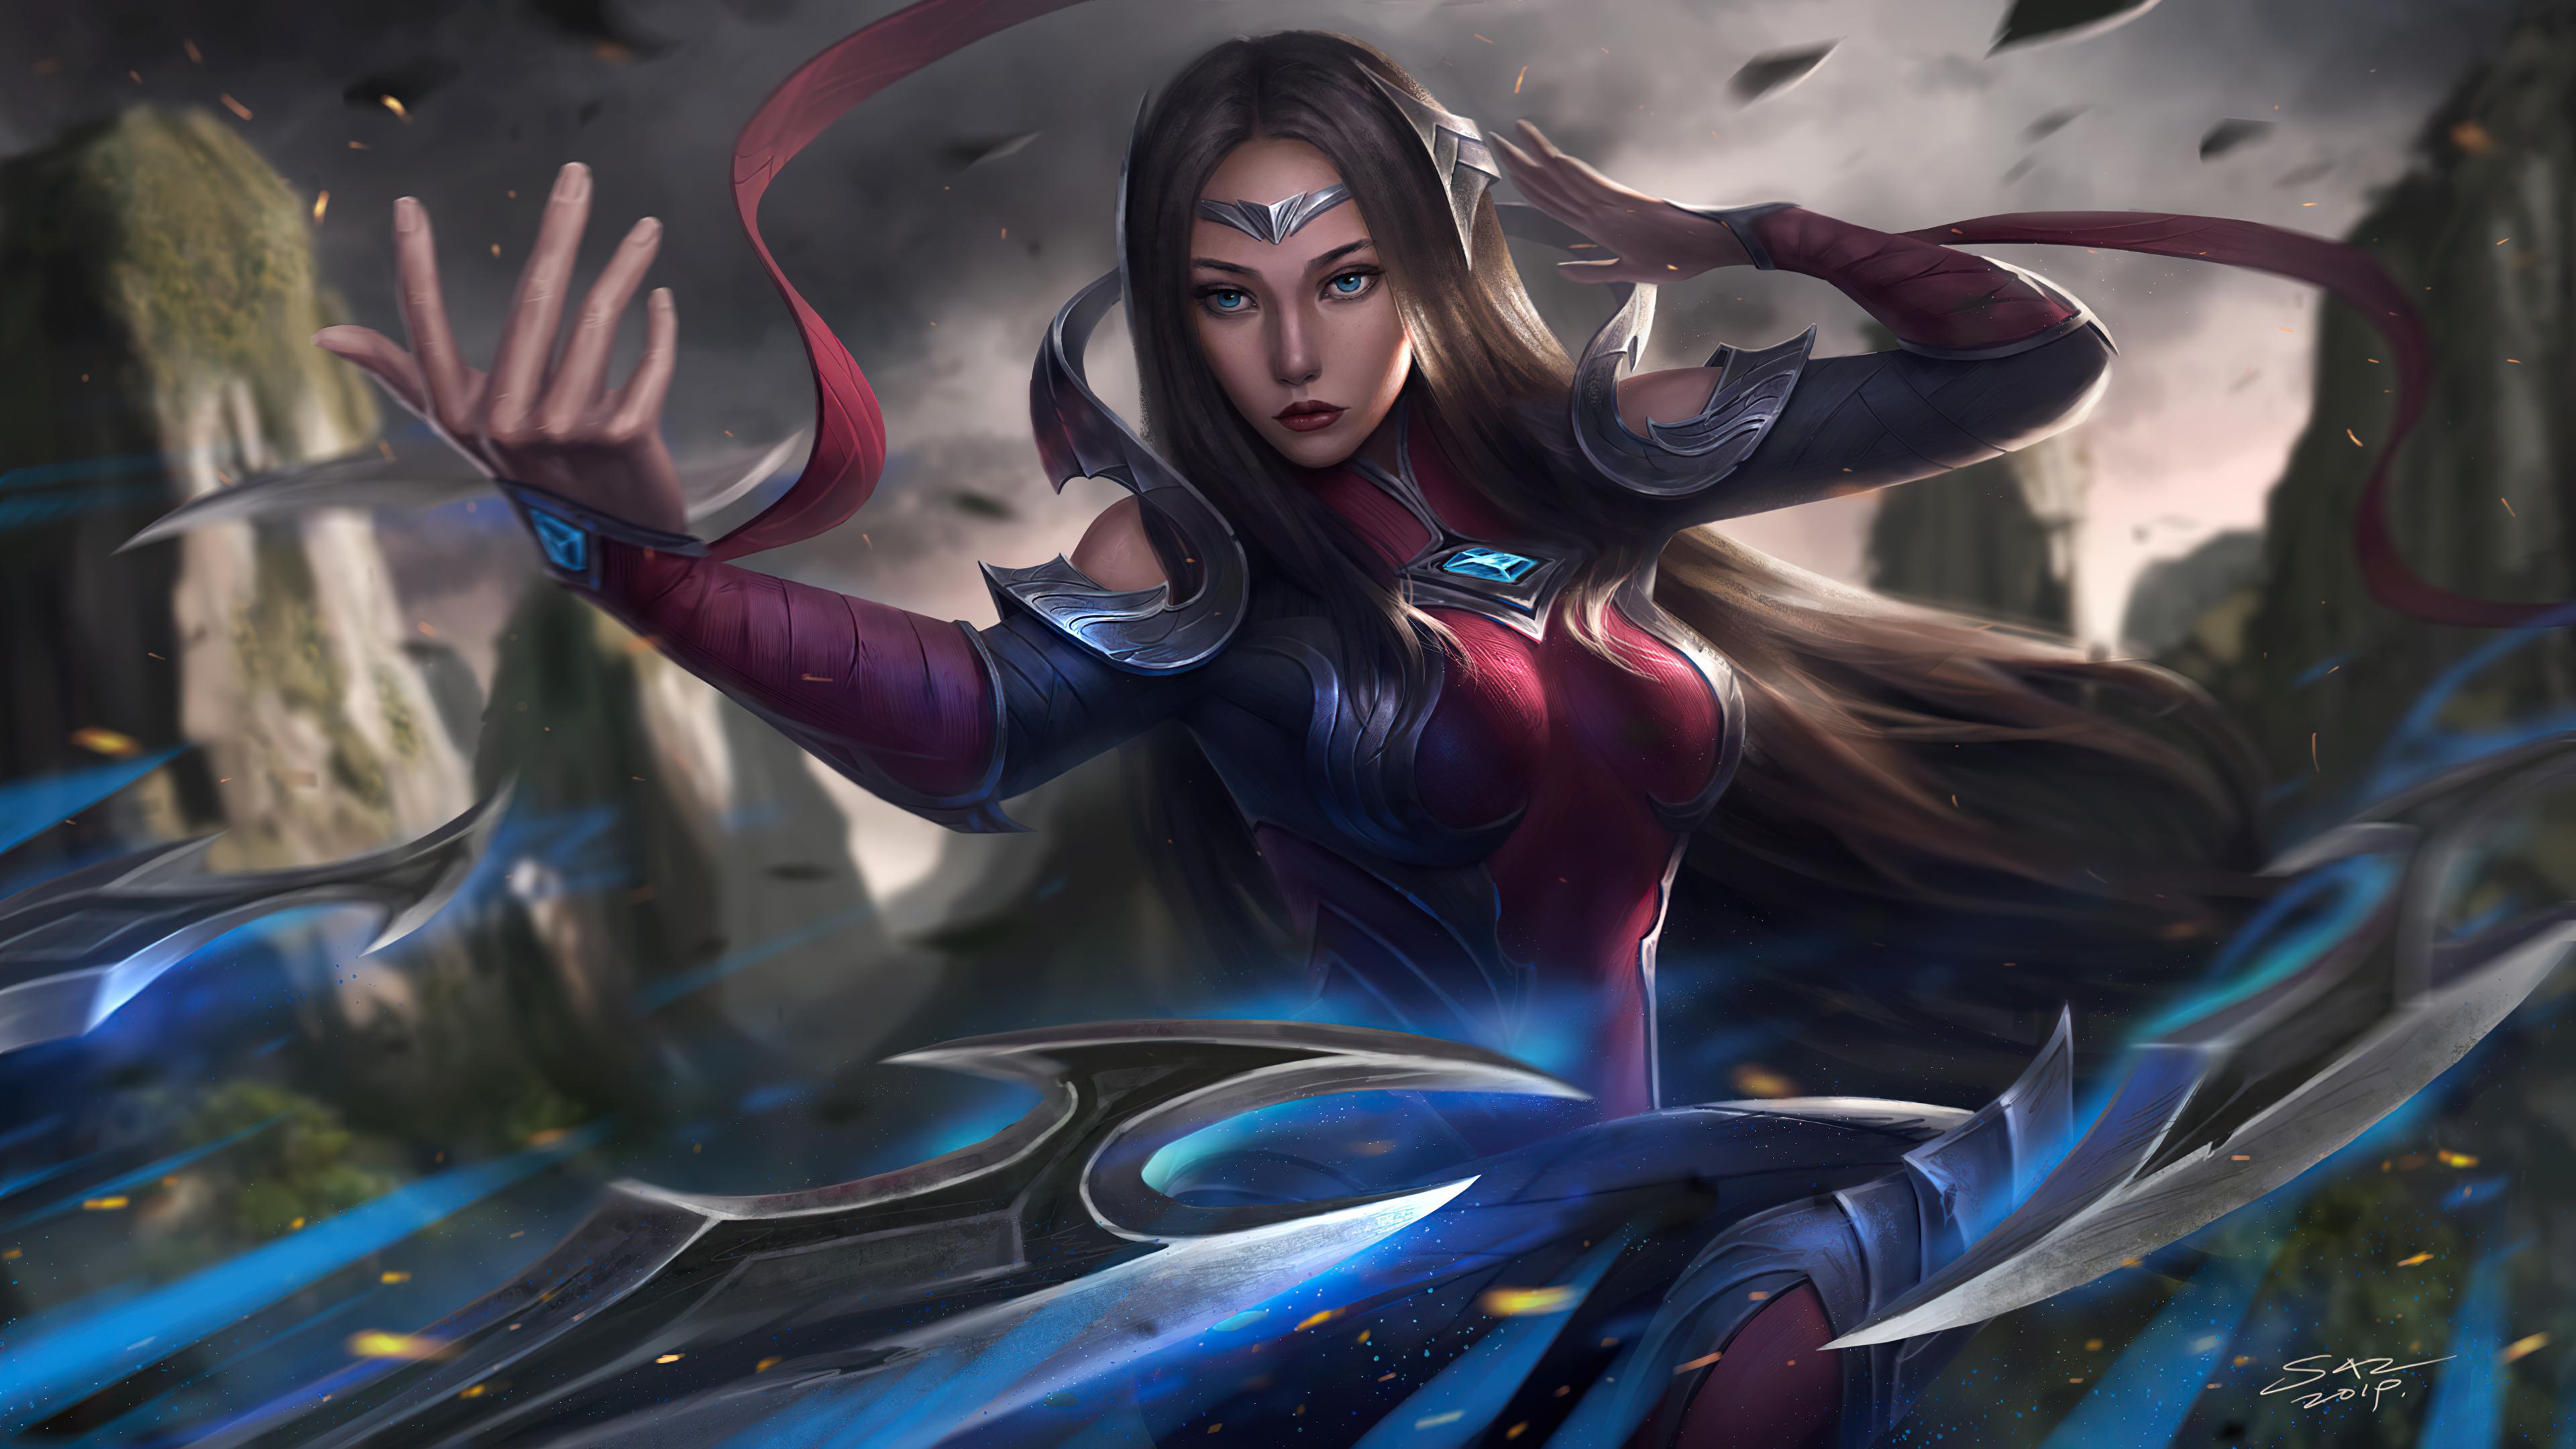 Wallpaper League of Legends Irelia Fanart